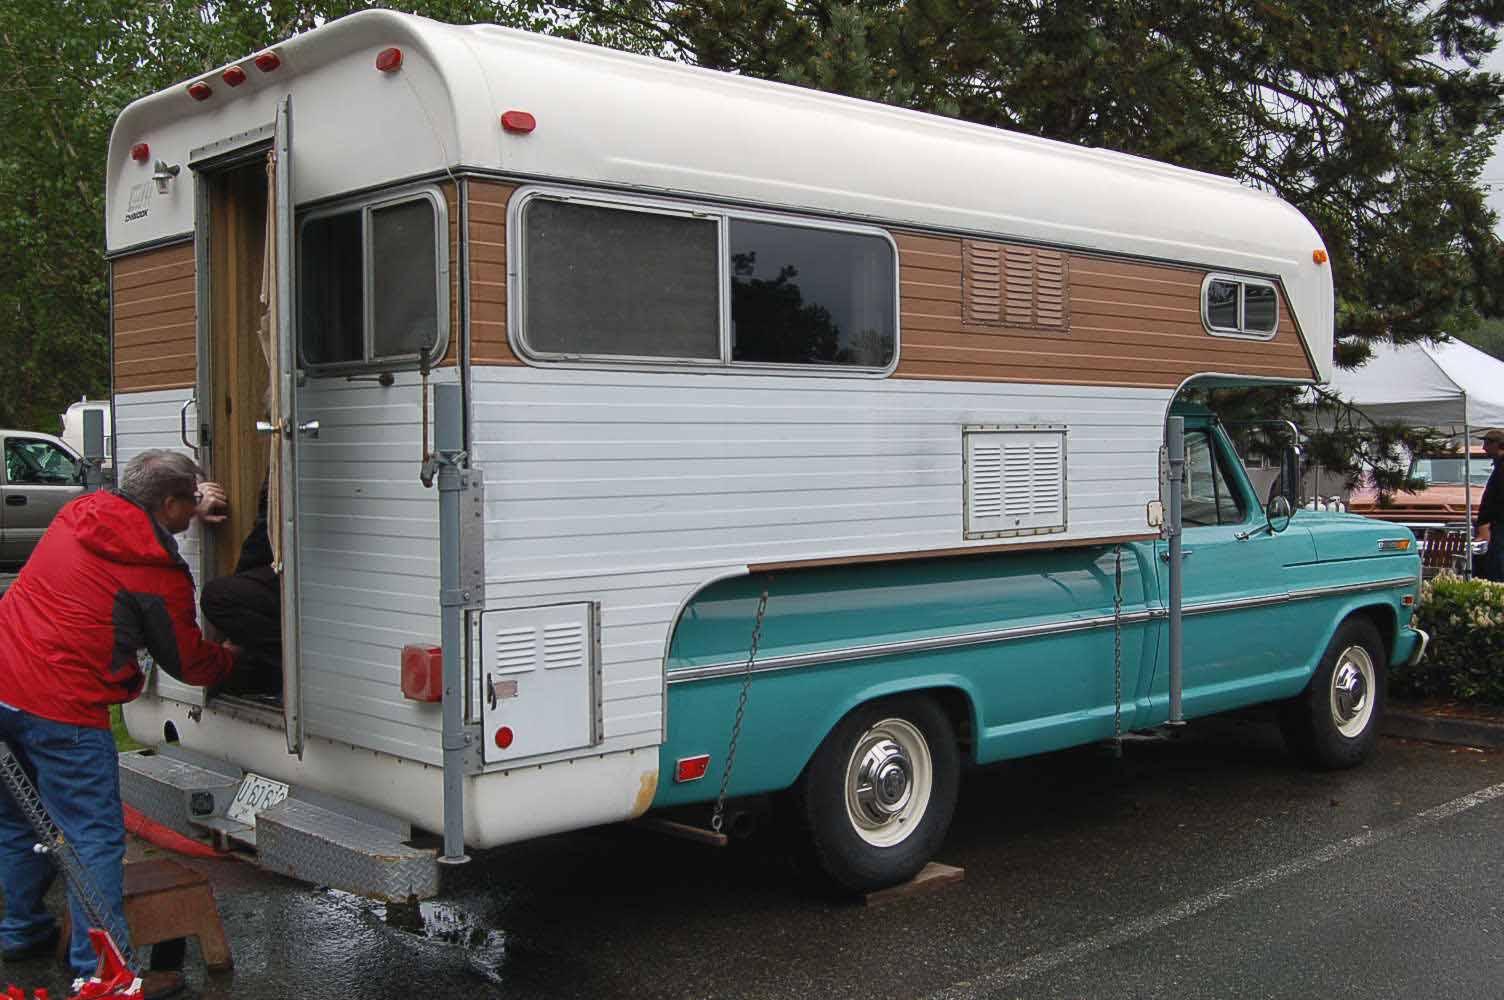 Vintage Truck Based Camper Trailers From Oldtrailercom